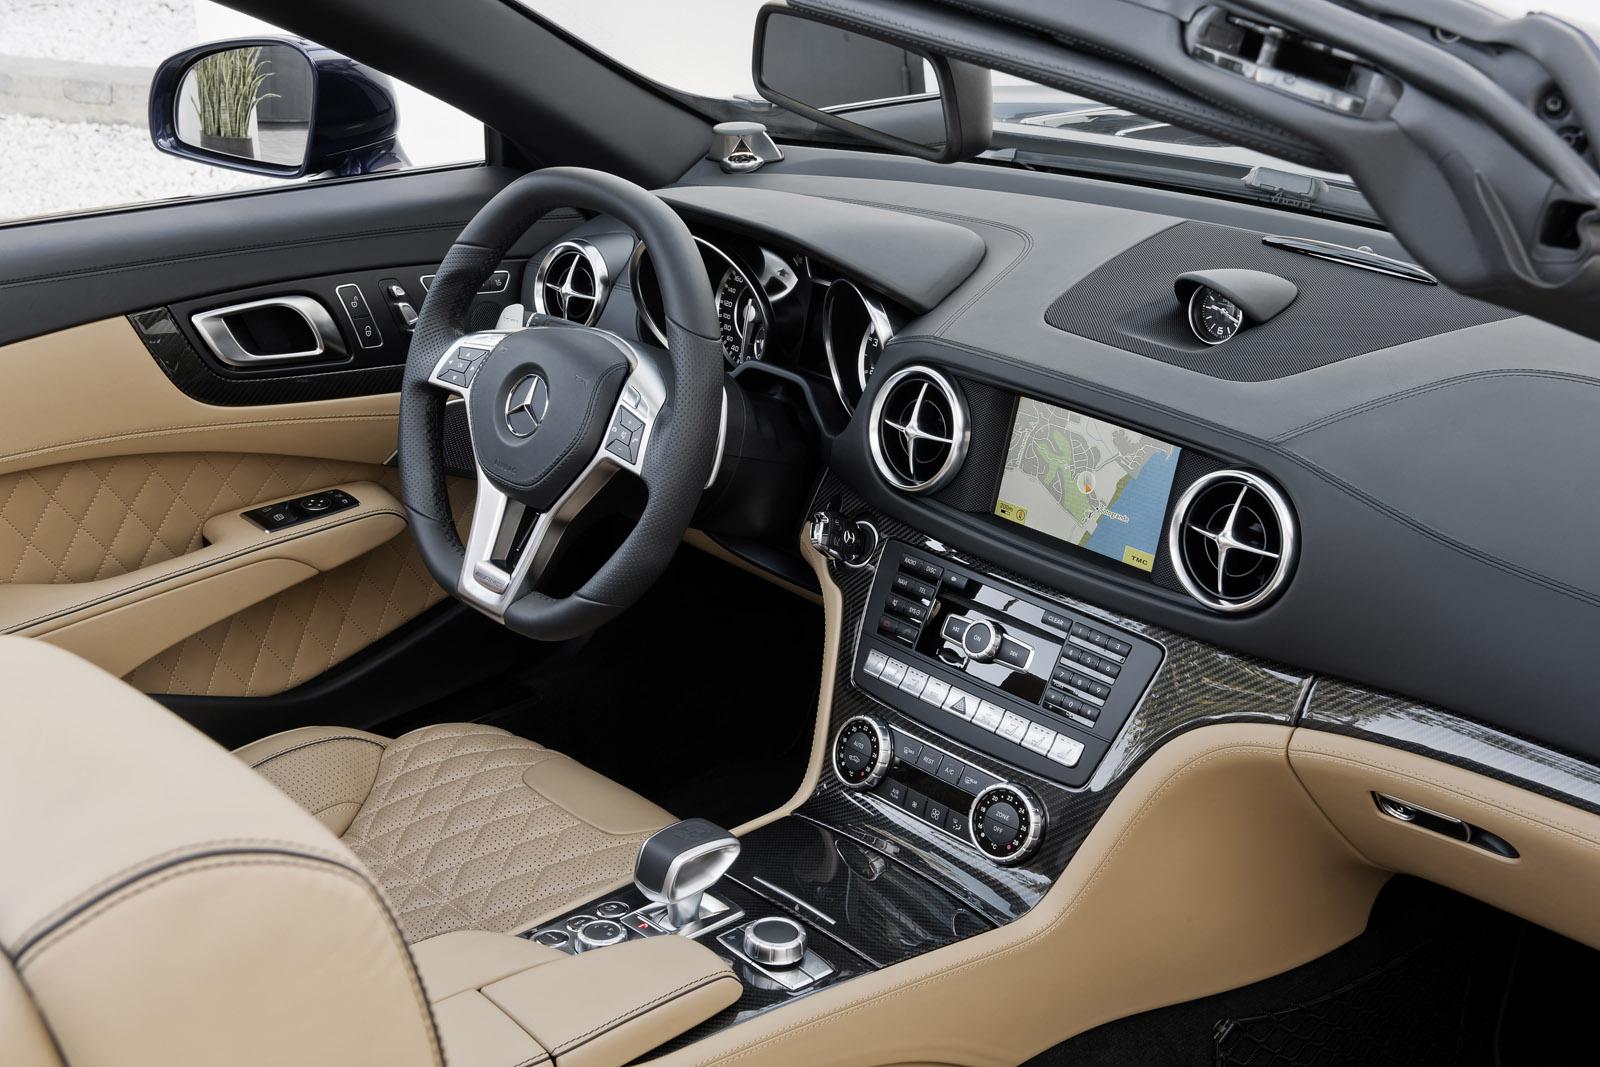 http://1.bp.blogspot.com/-jFQ_LNRR1Hc/T-N3opvtPiI/AAAAAAAAD08/ZTHwBGe3kcI/s1600/Mercedes-Benz+SL65+AMG+Hd+Wallpapers+2013_6.jpg